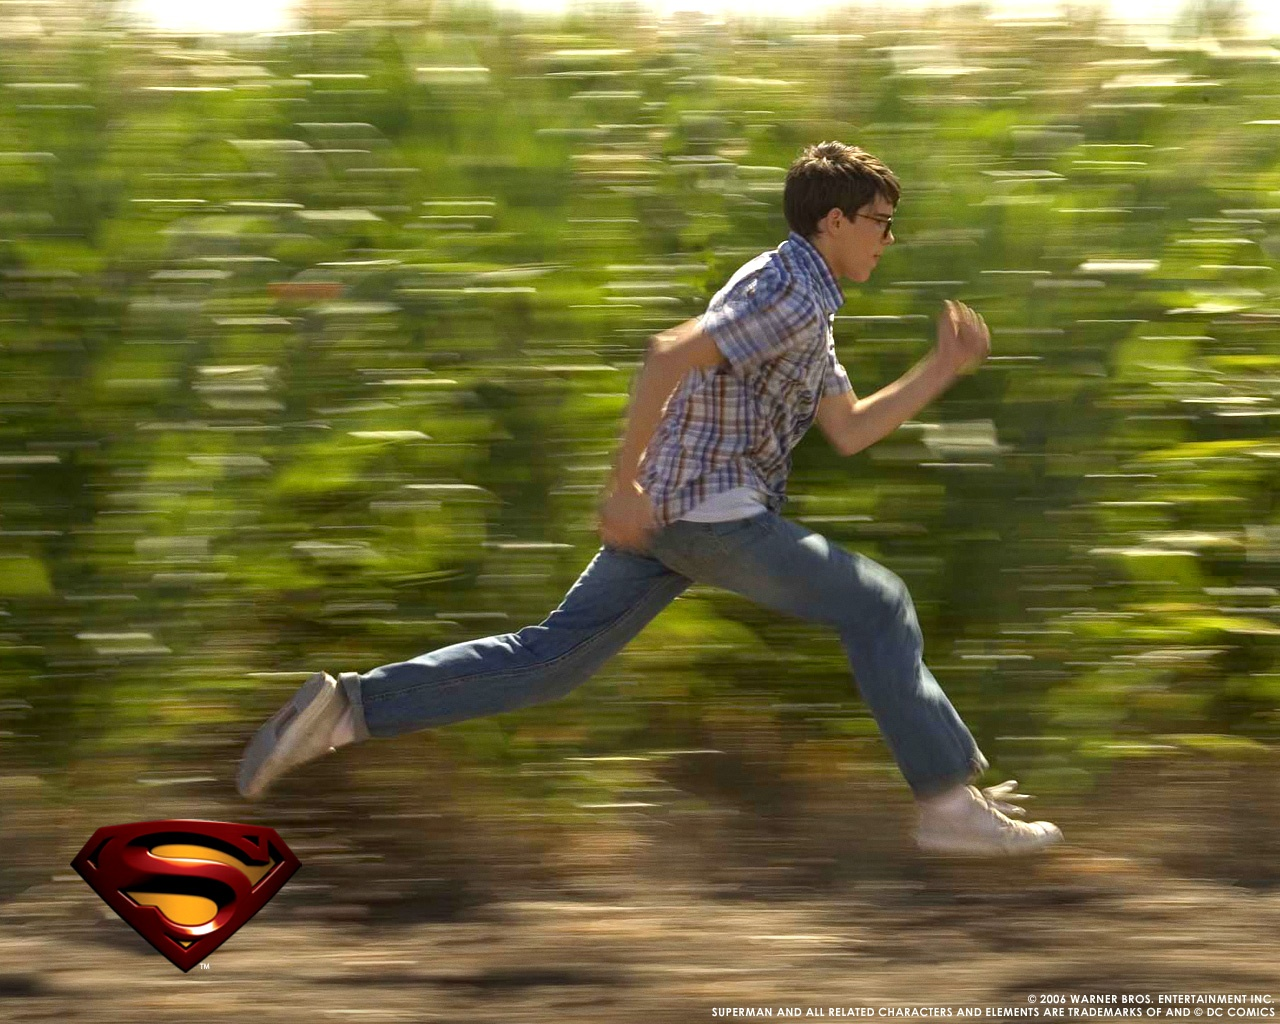 1280x1024 Superman running desktop PC and Mac wallpaper 1280x1024